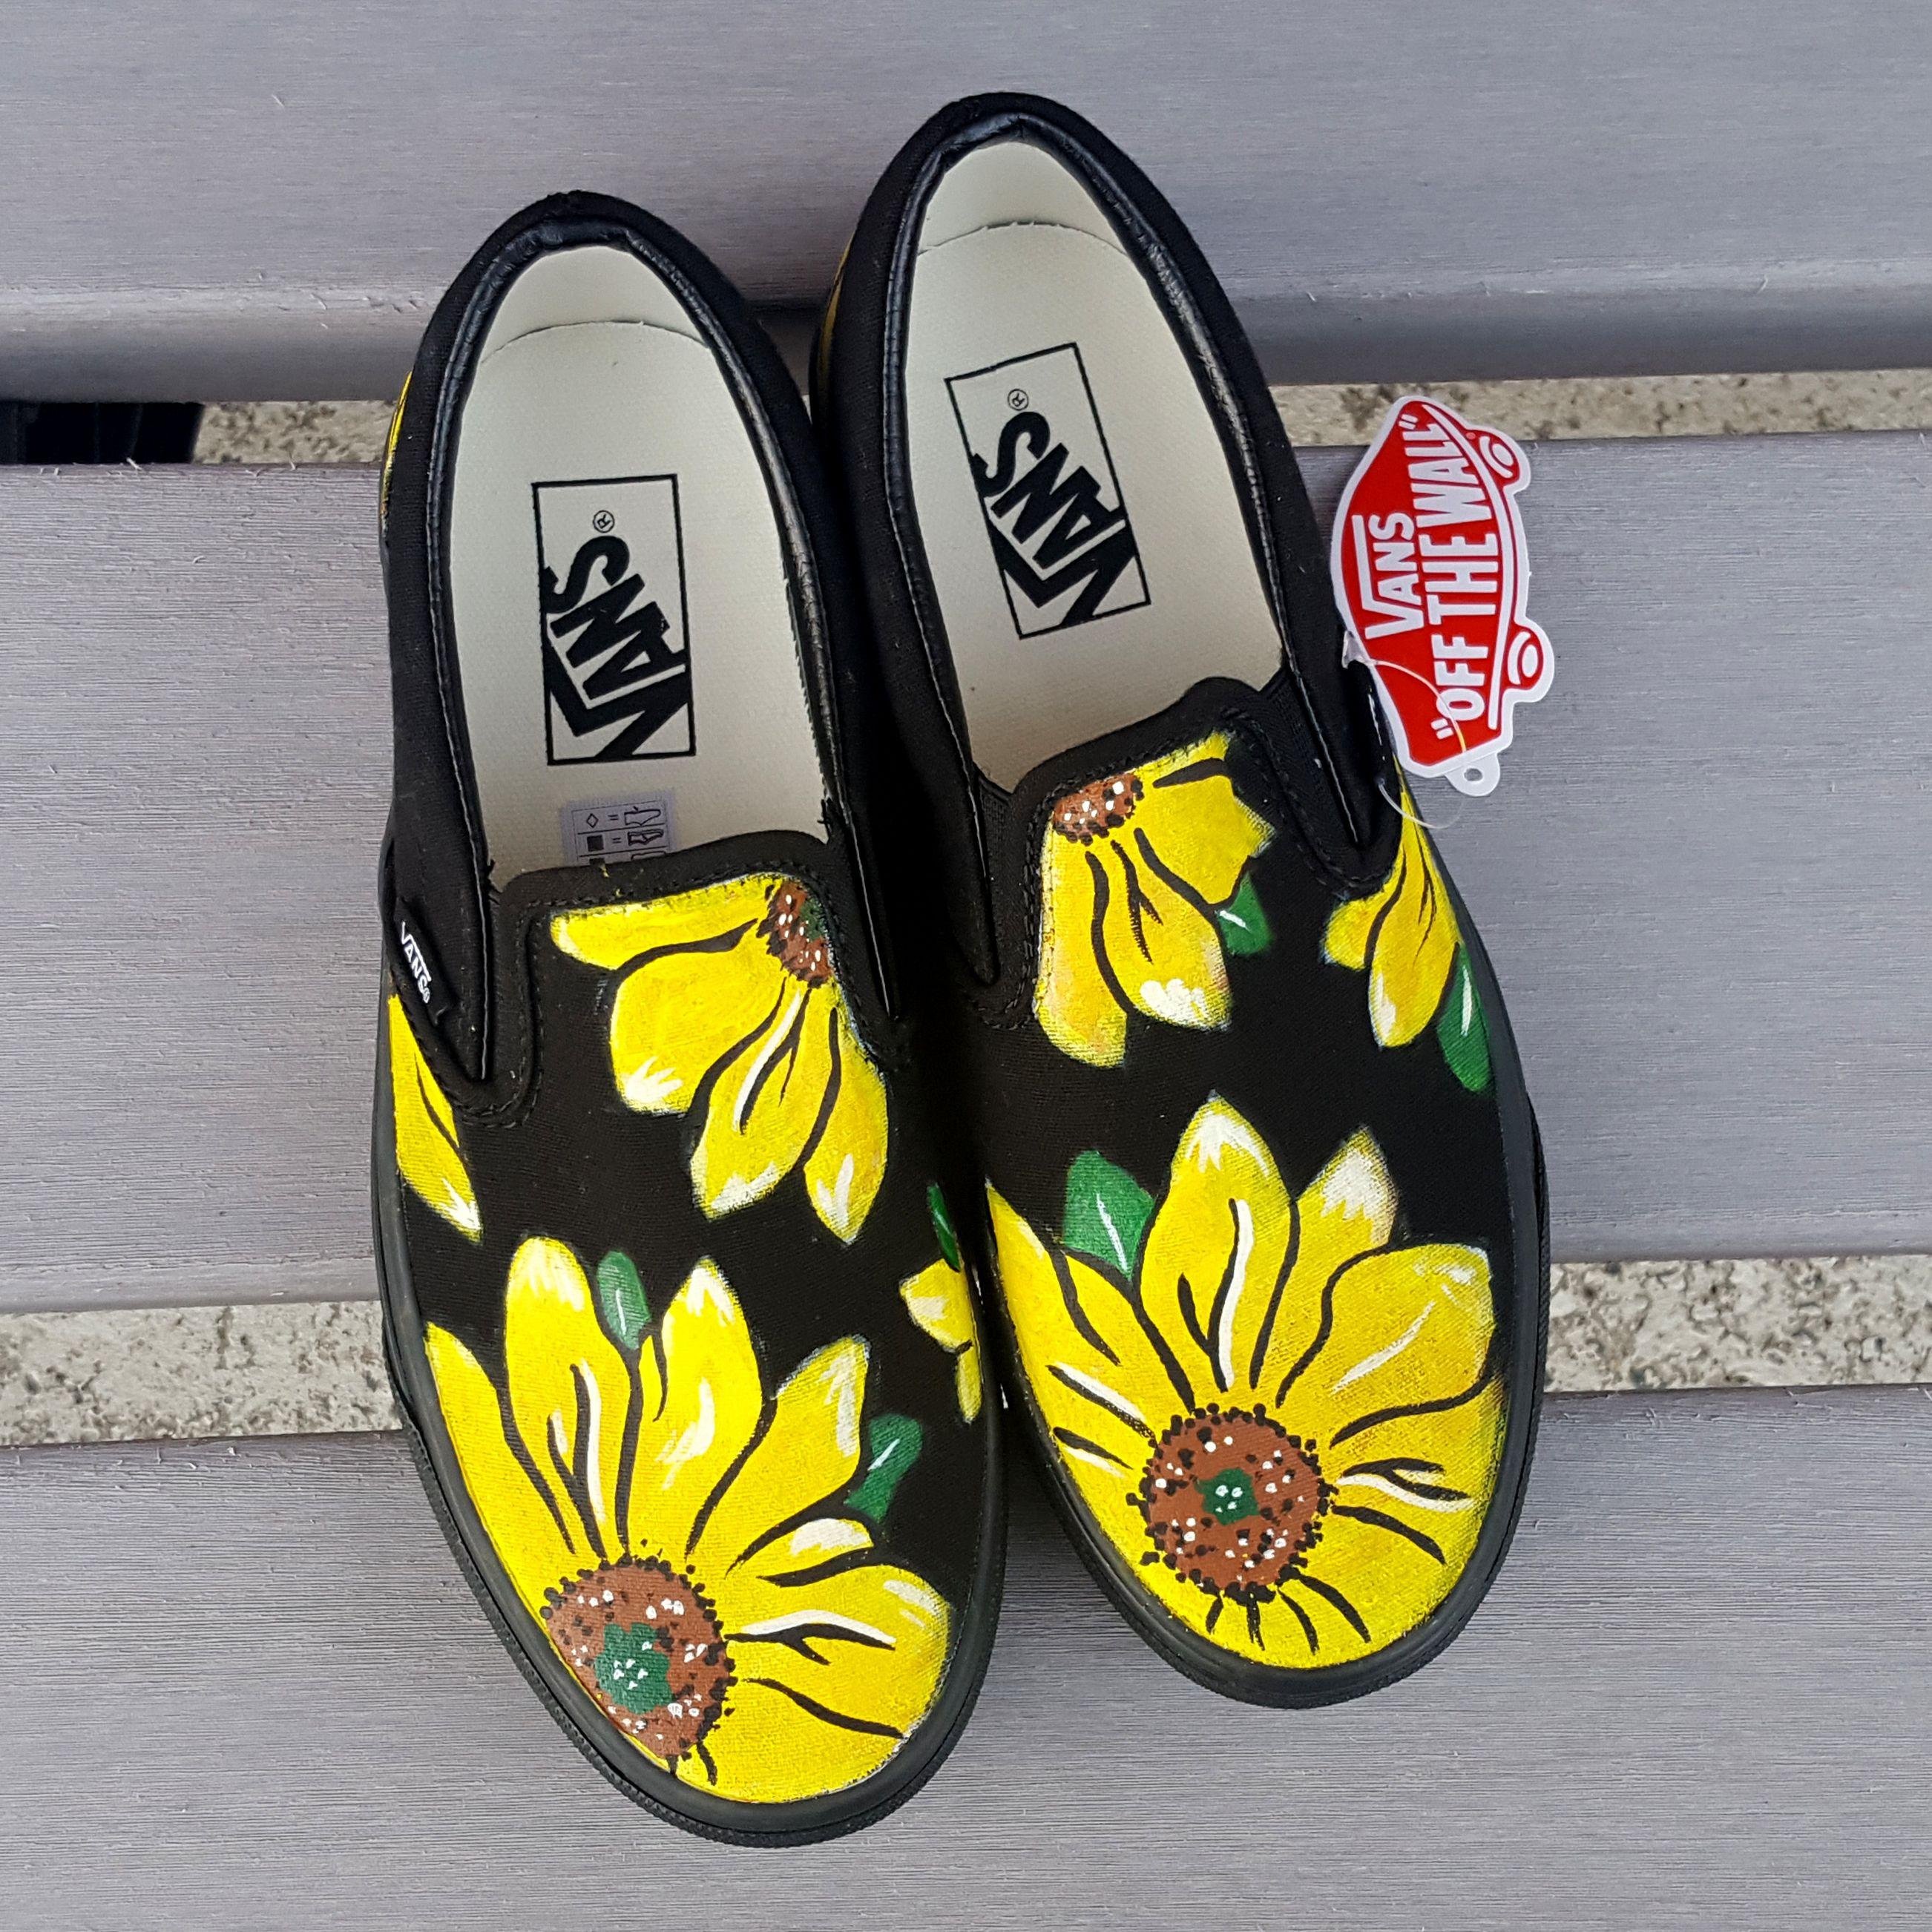 Custom Floral Vans Shoes Hand Painted